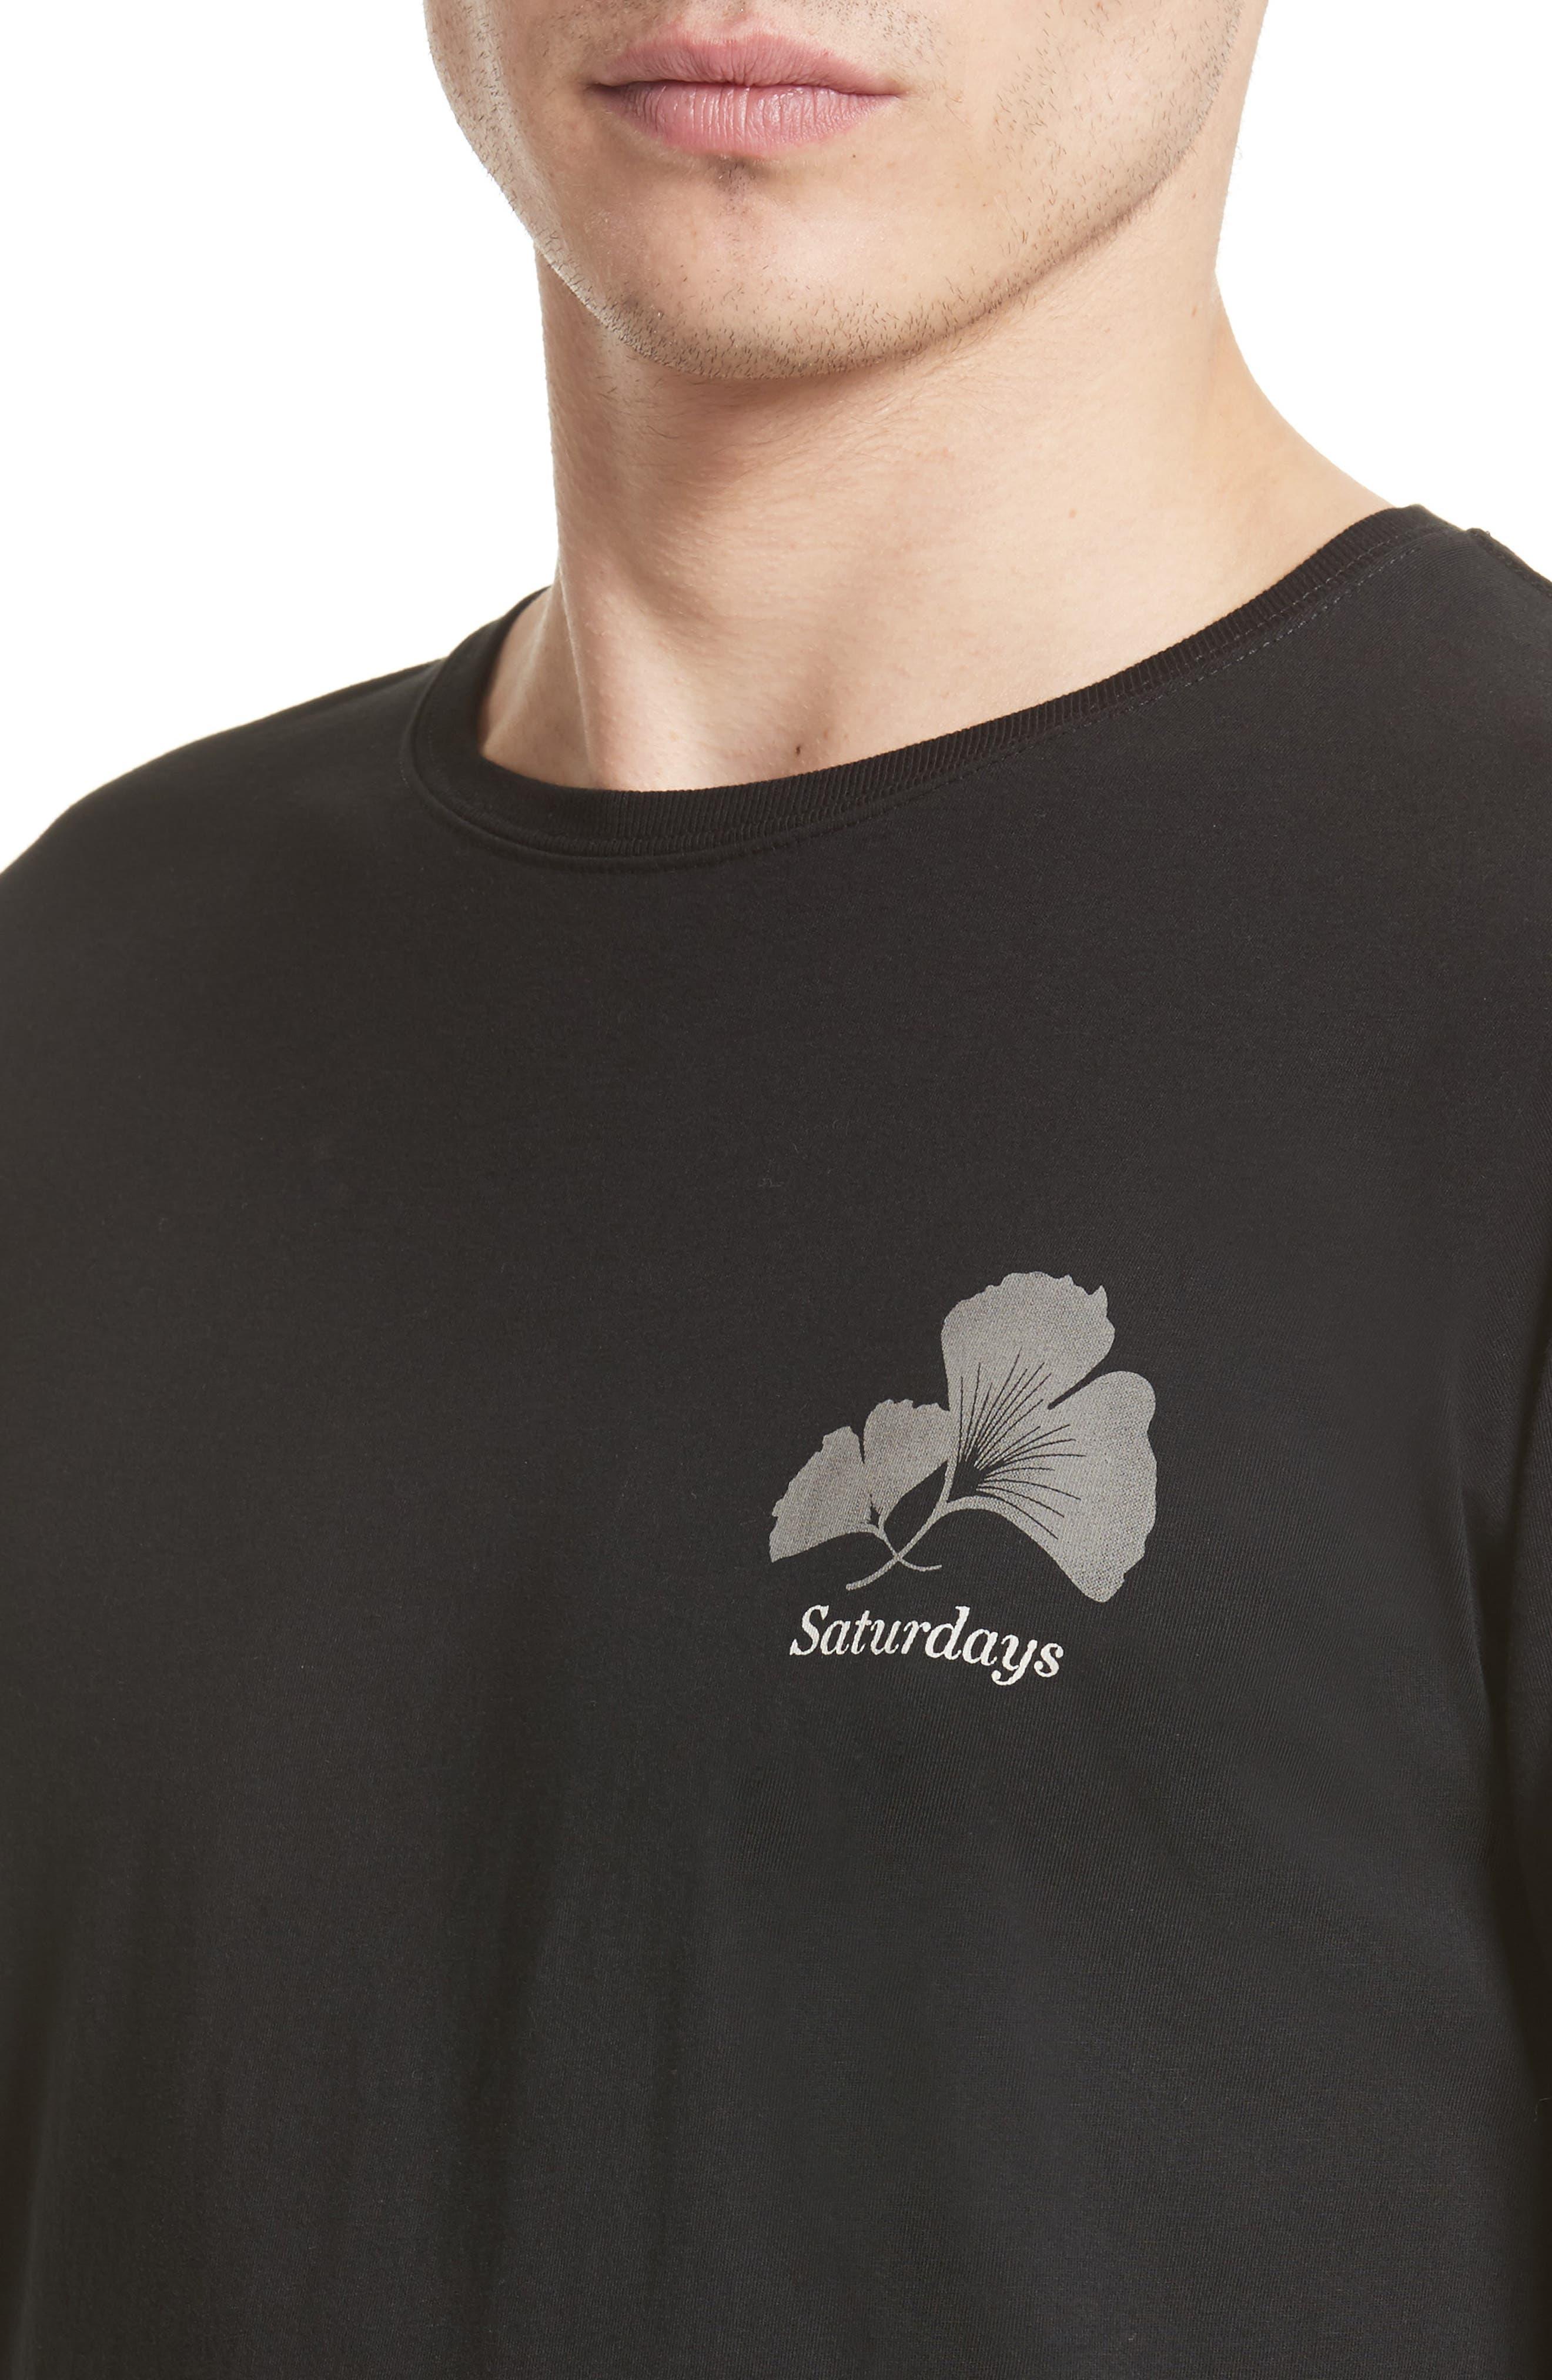 Ginkgo Graphic T-Shirt,                             Alternate thumbnail 4, color,                             Black